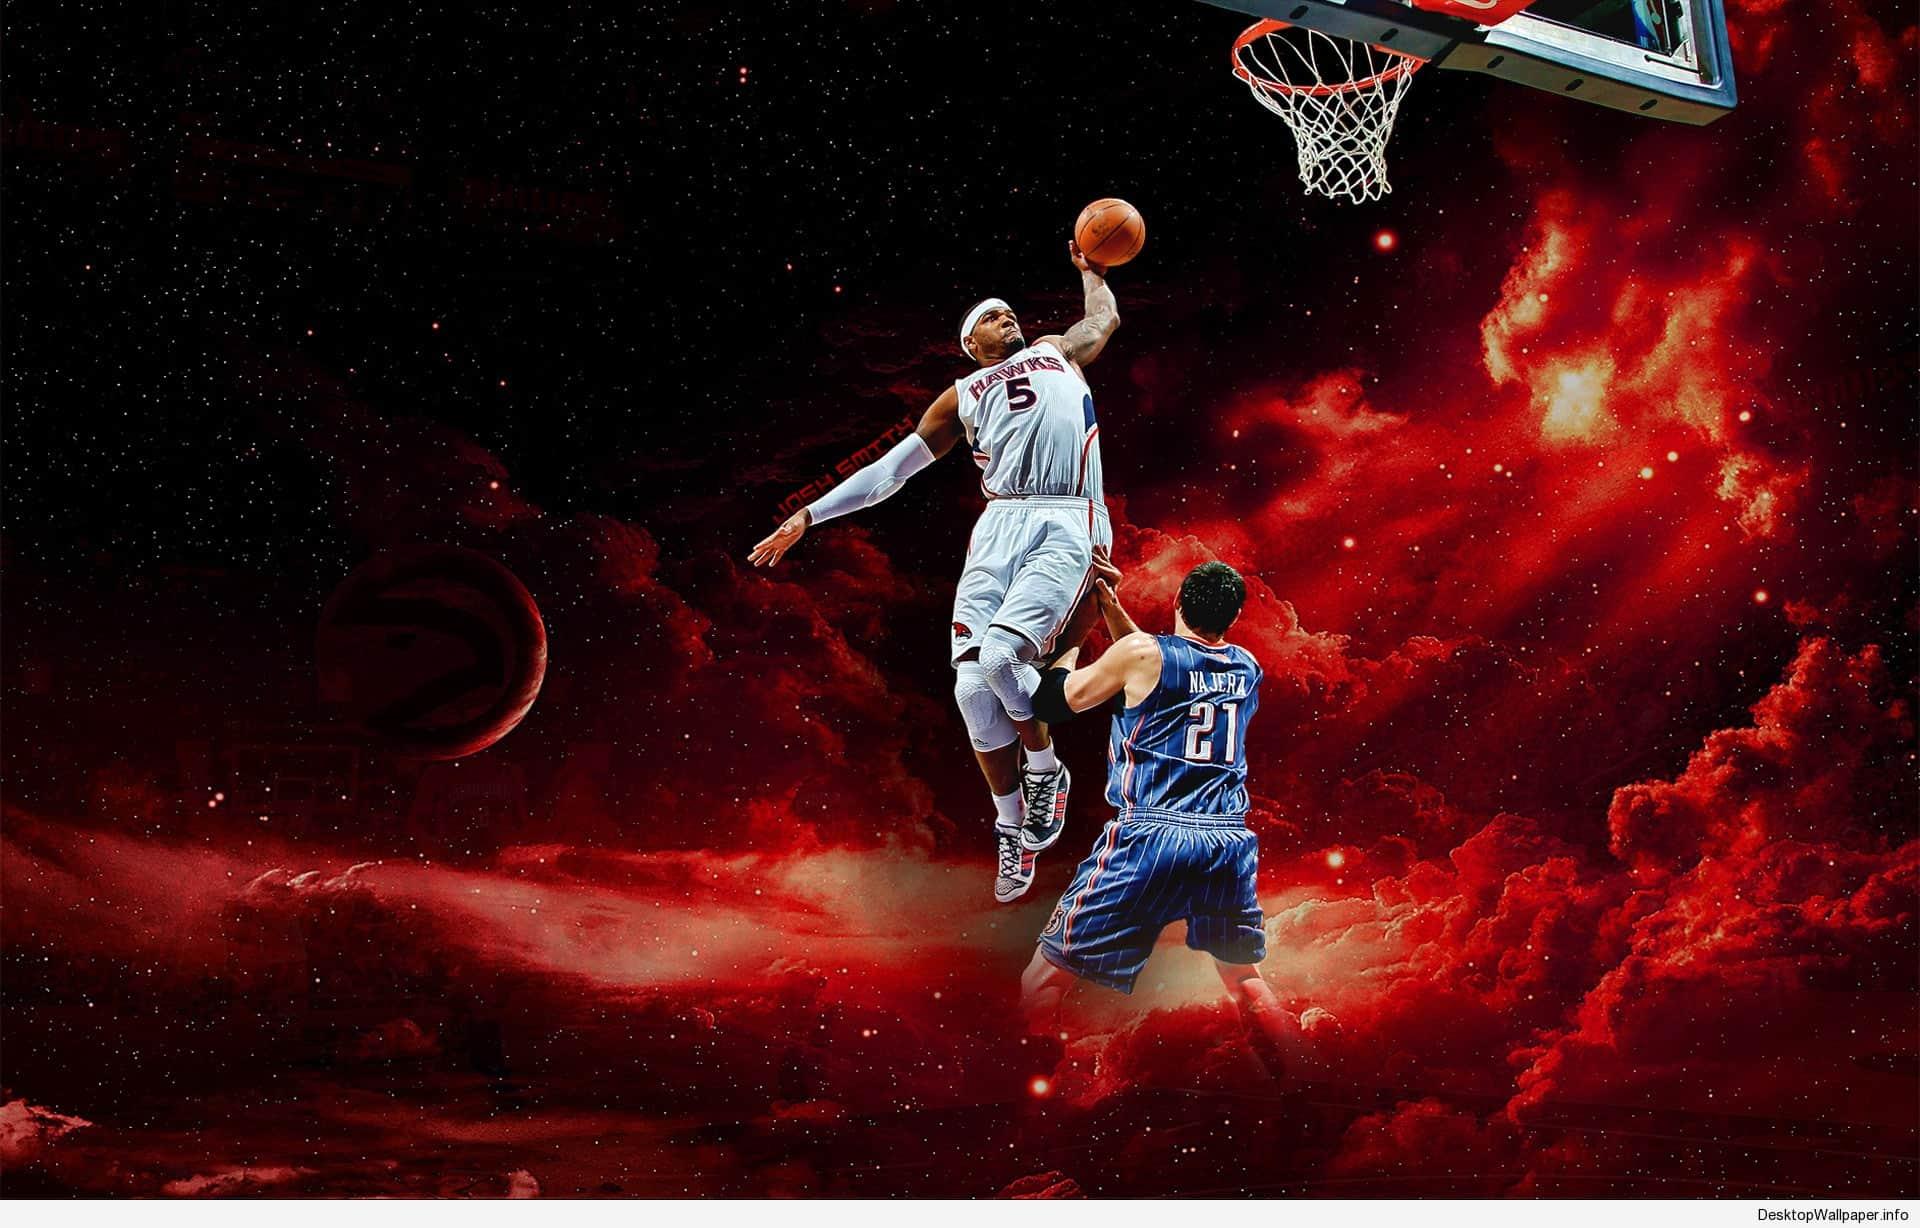 Nba Desktop Wallpapers Top Free Nba Desktop Backgrounds